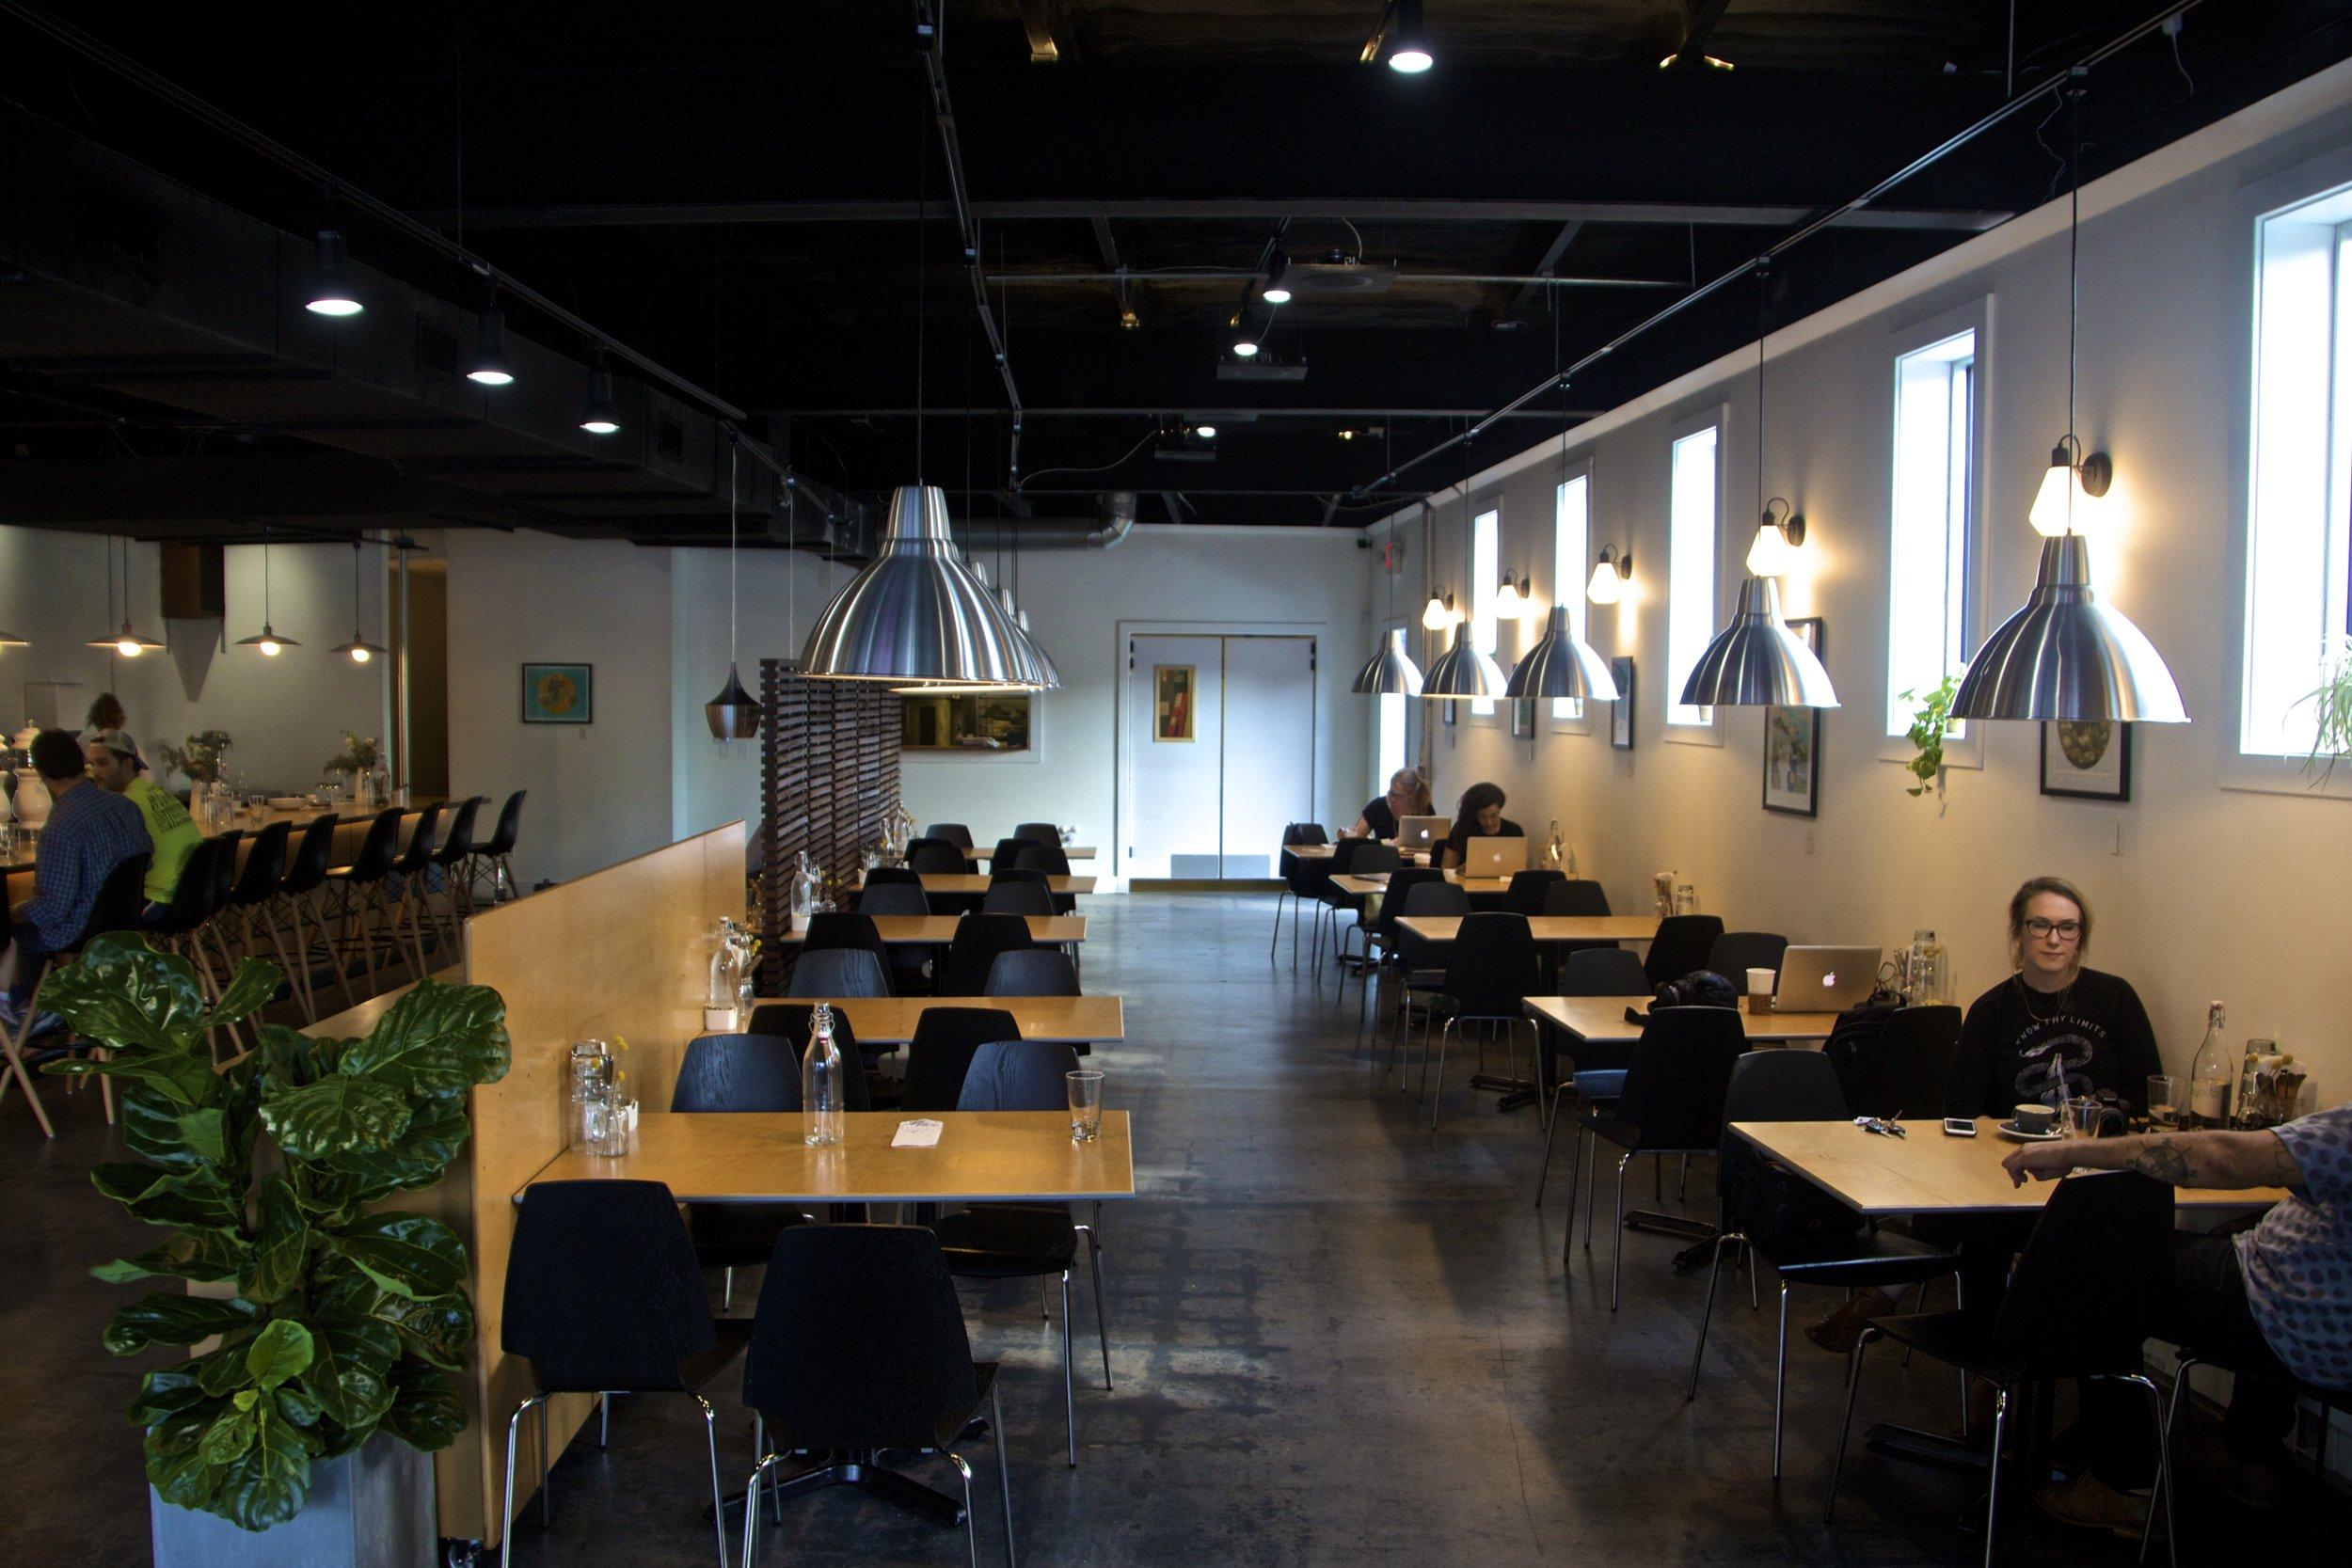 nashville coffee shops dose 2.jpg